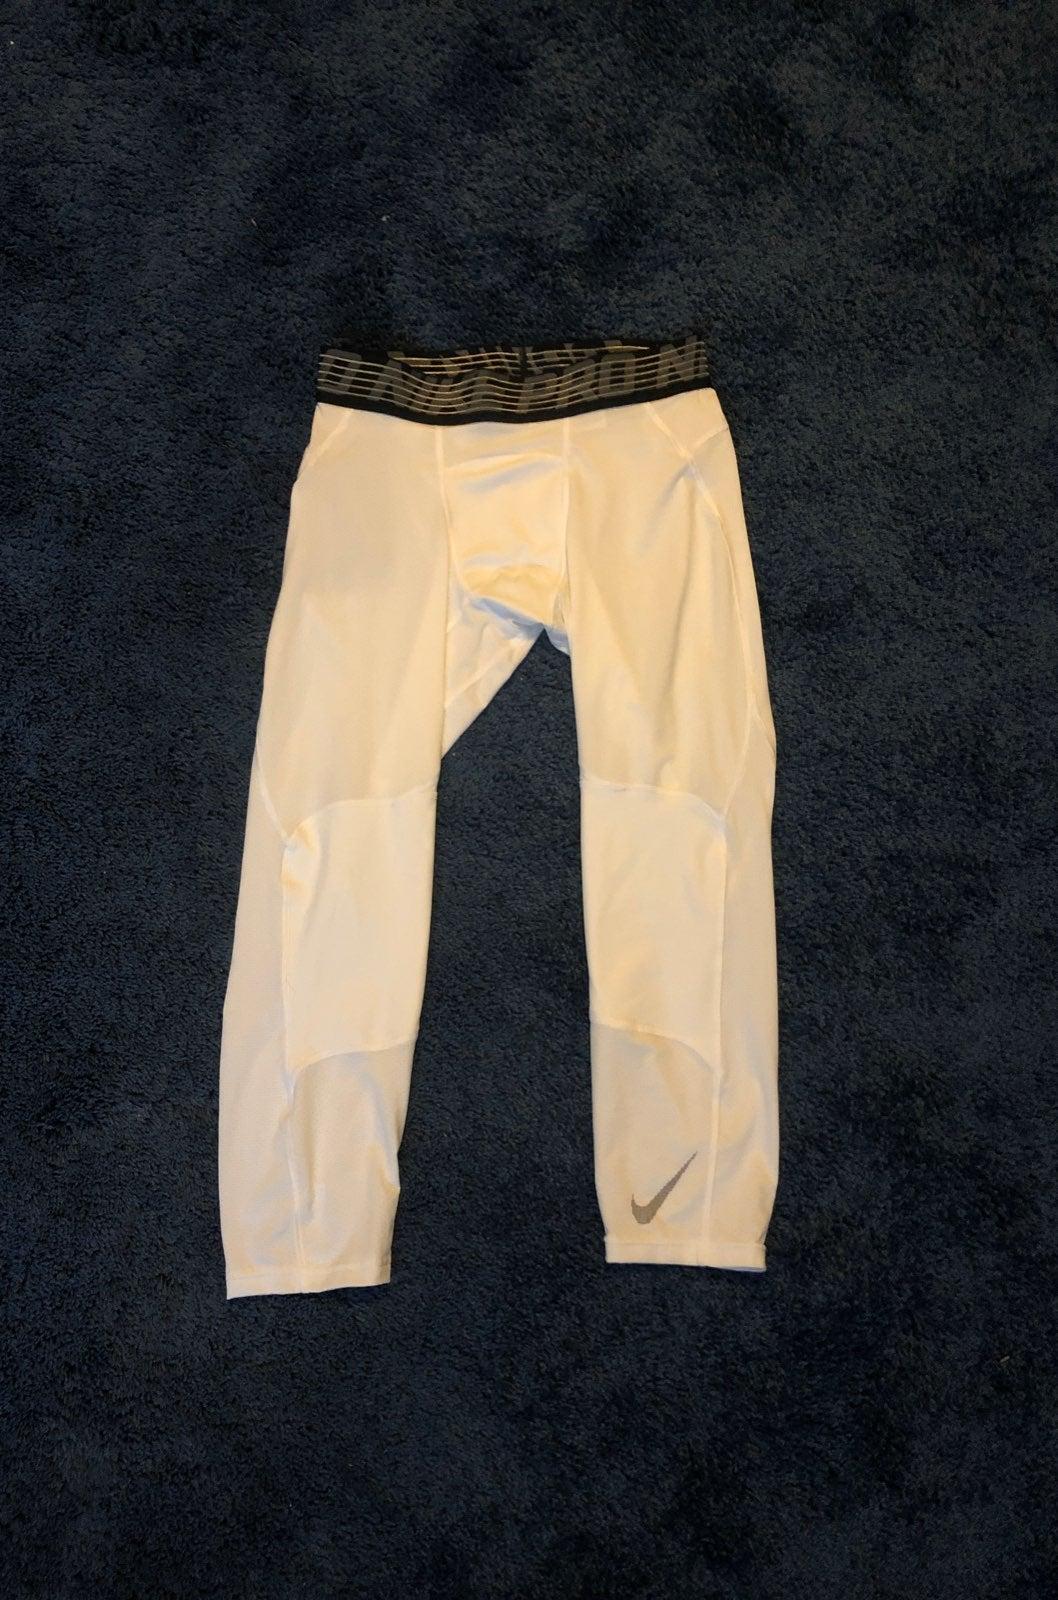 Nike pro tights/leggings